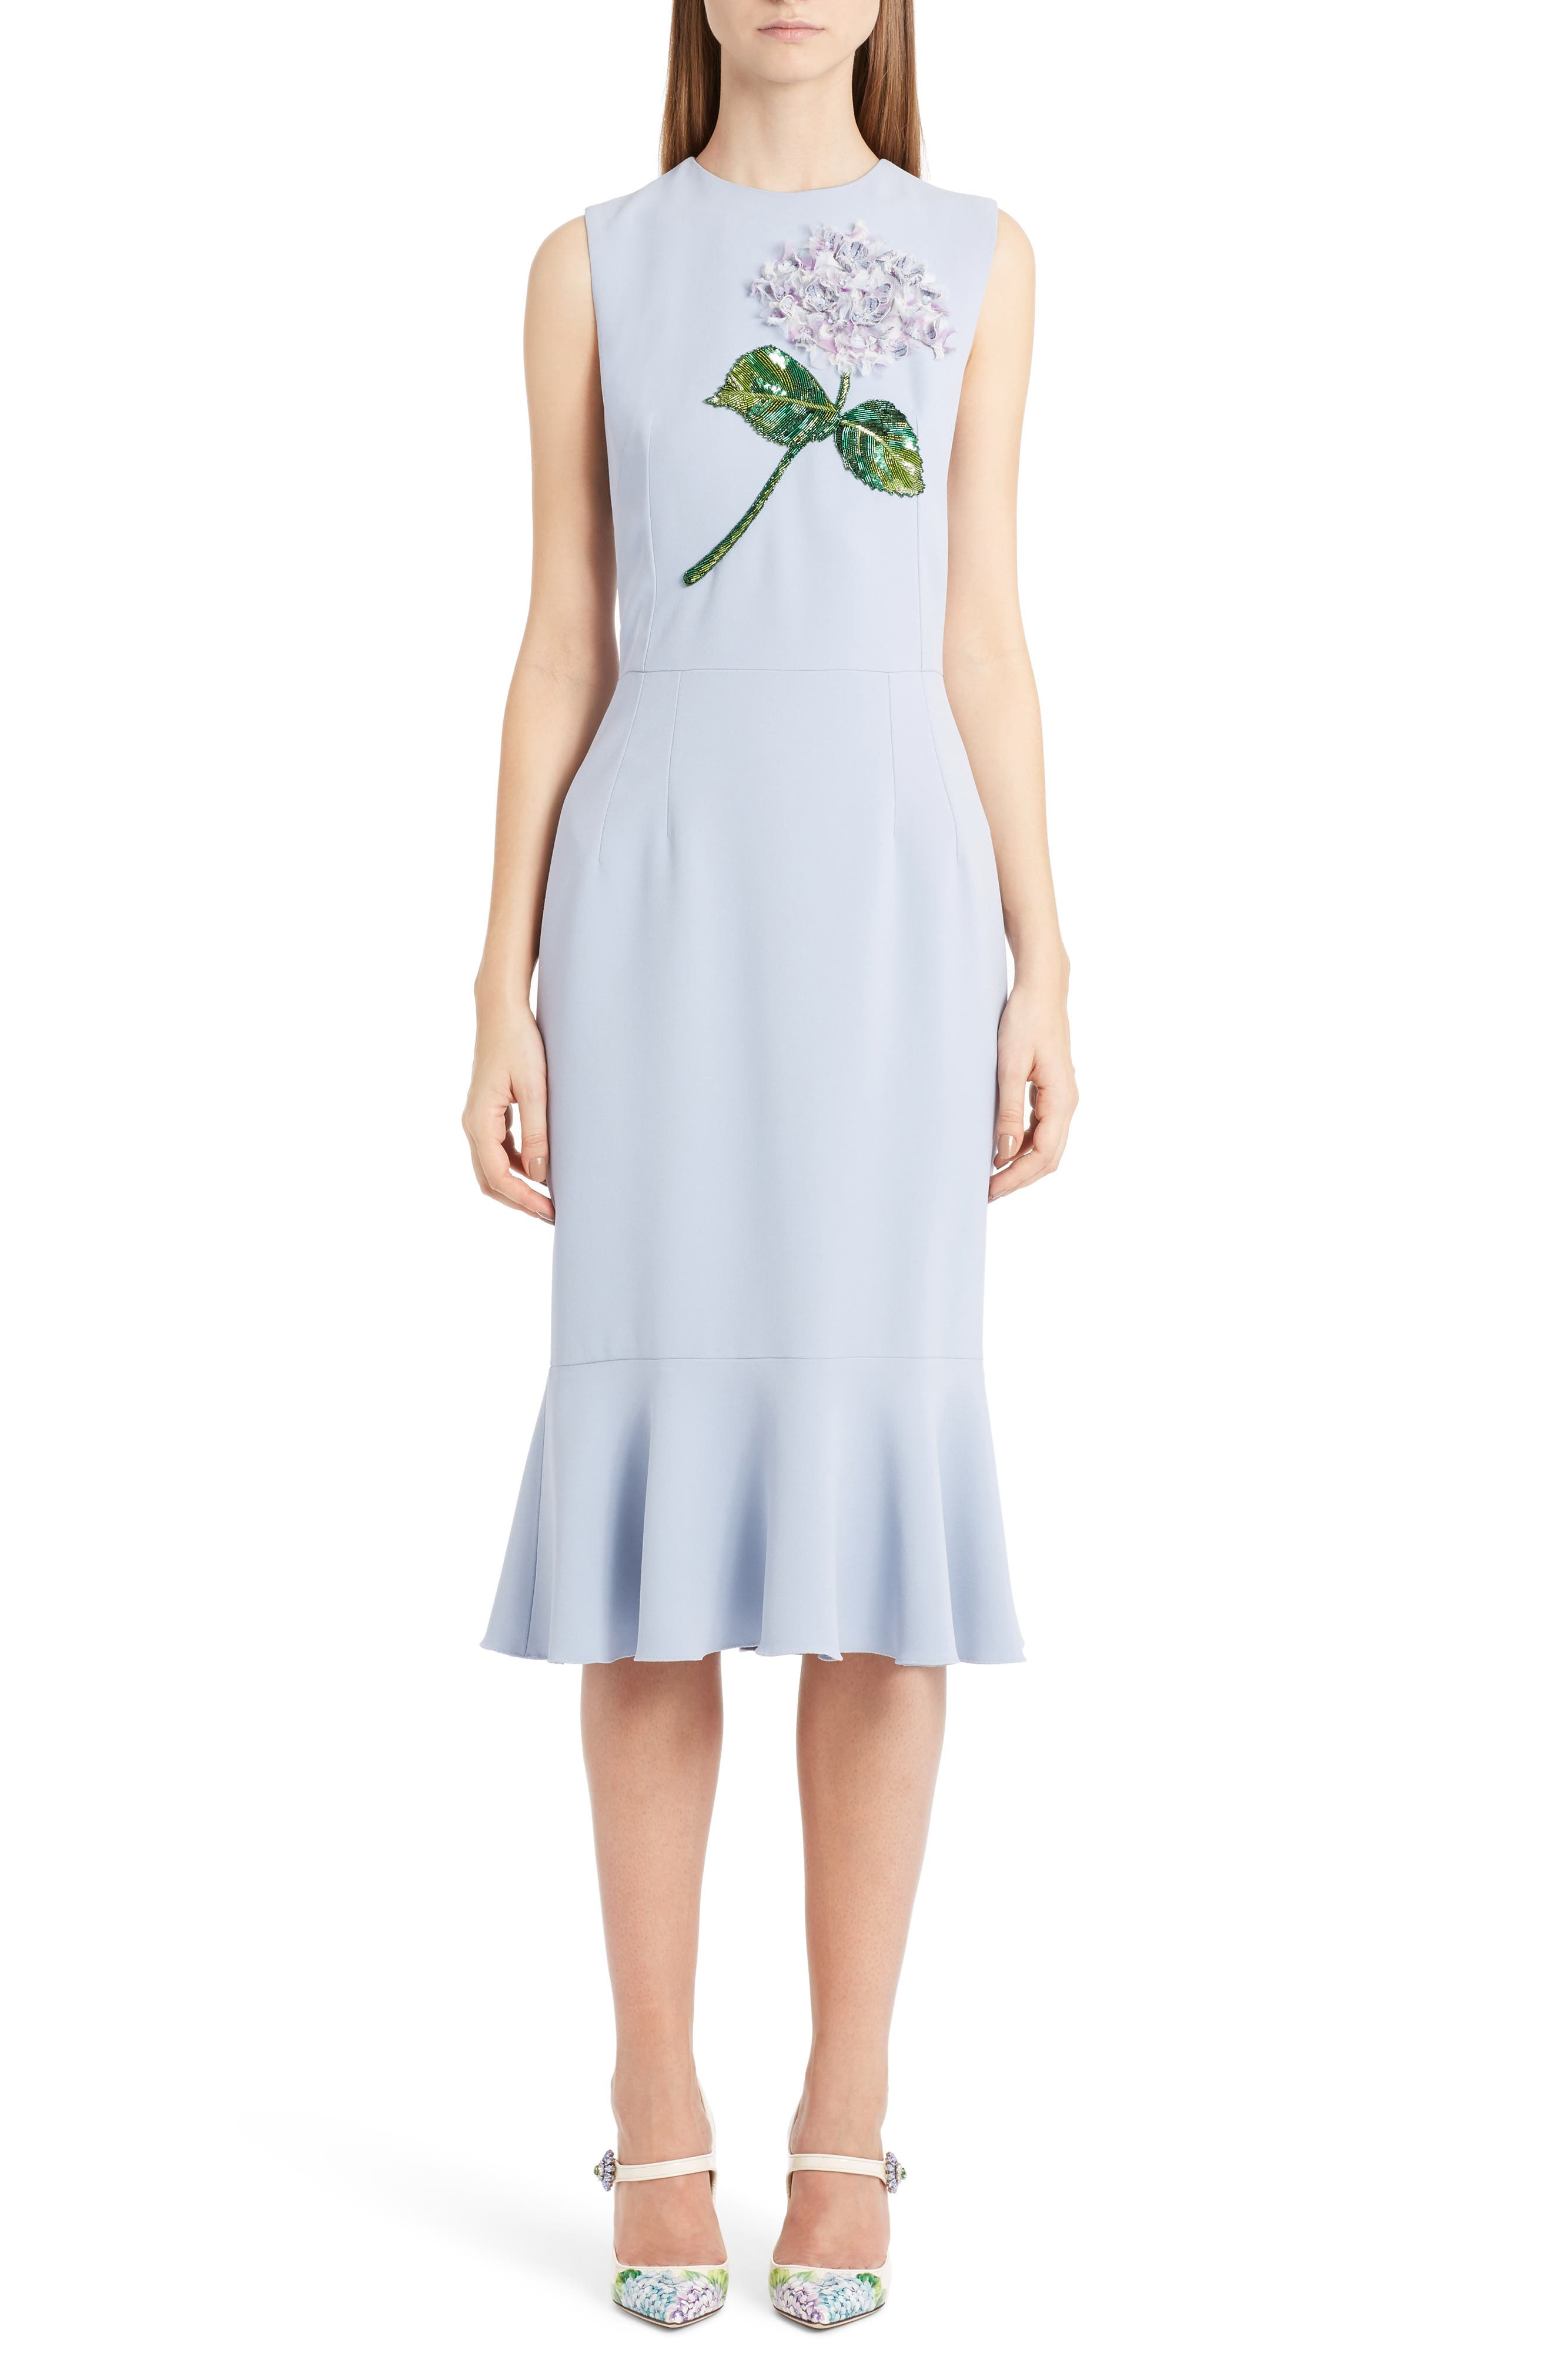 Dolce&Gabbana Embellished Ruffle Hem Dress